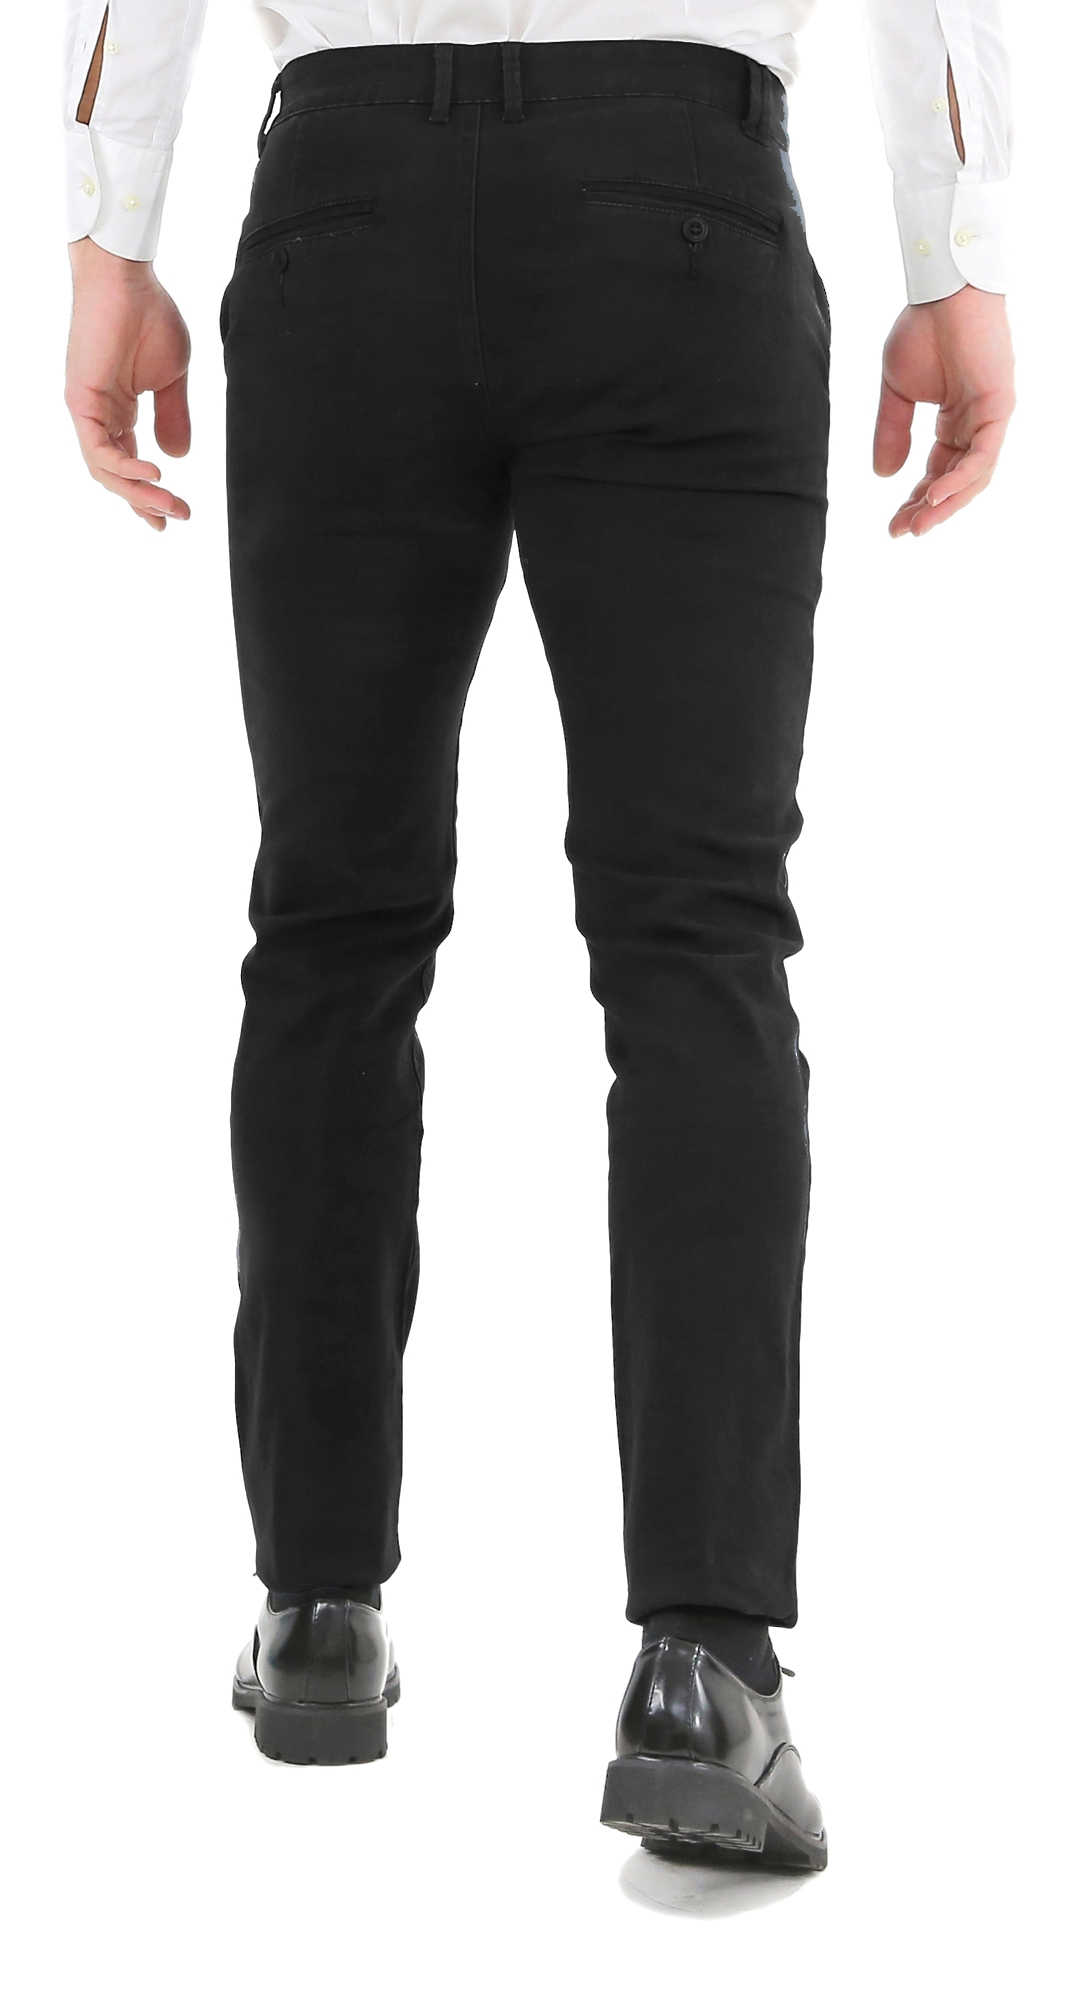 Pantaloni-Uomo-Slim-Fit-Eleganti-Invernali-Blu-Nero-Classico-Chino-Tasca-America miniatura 13